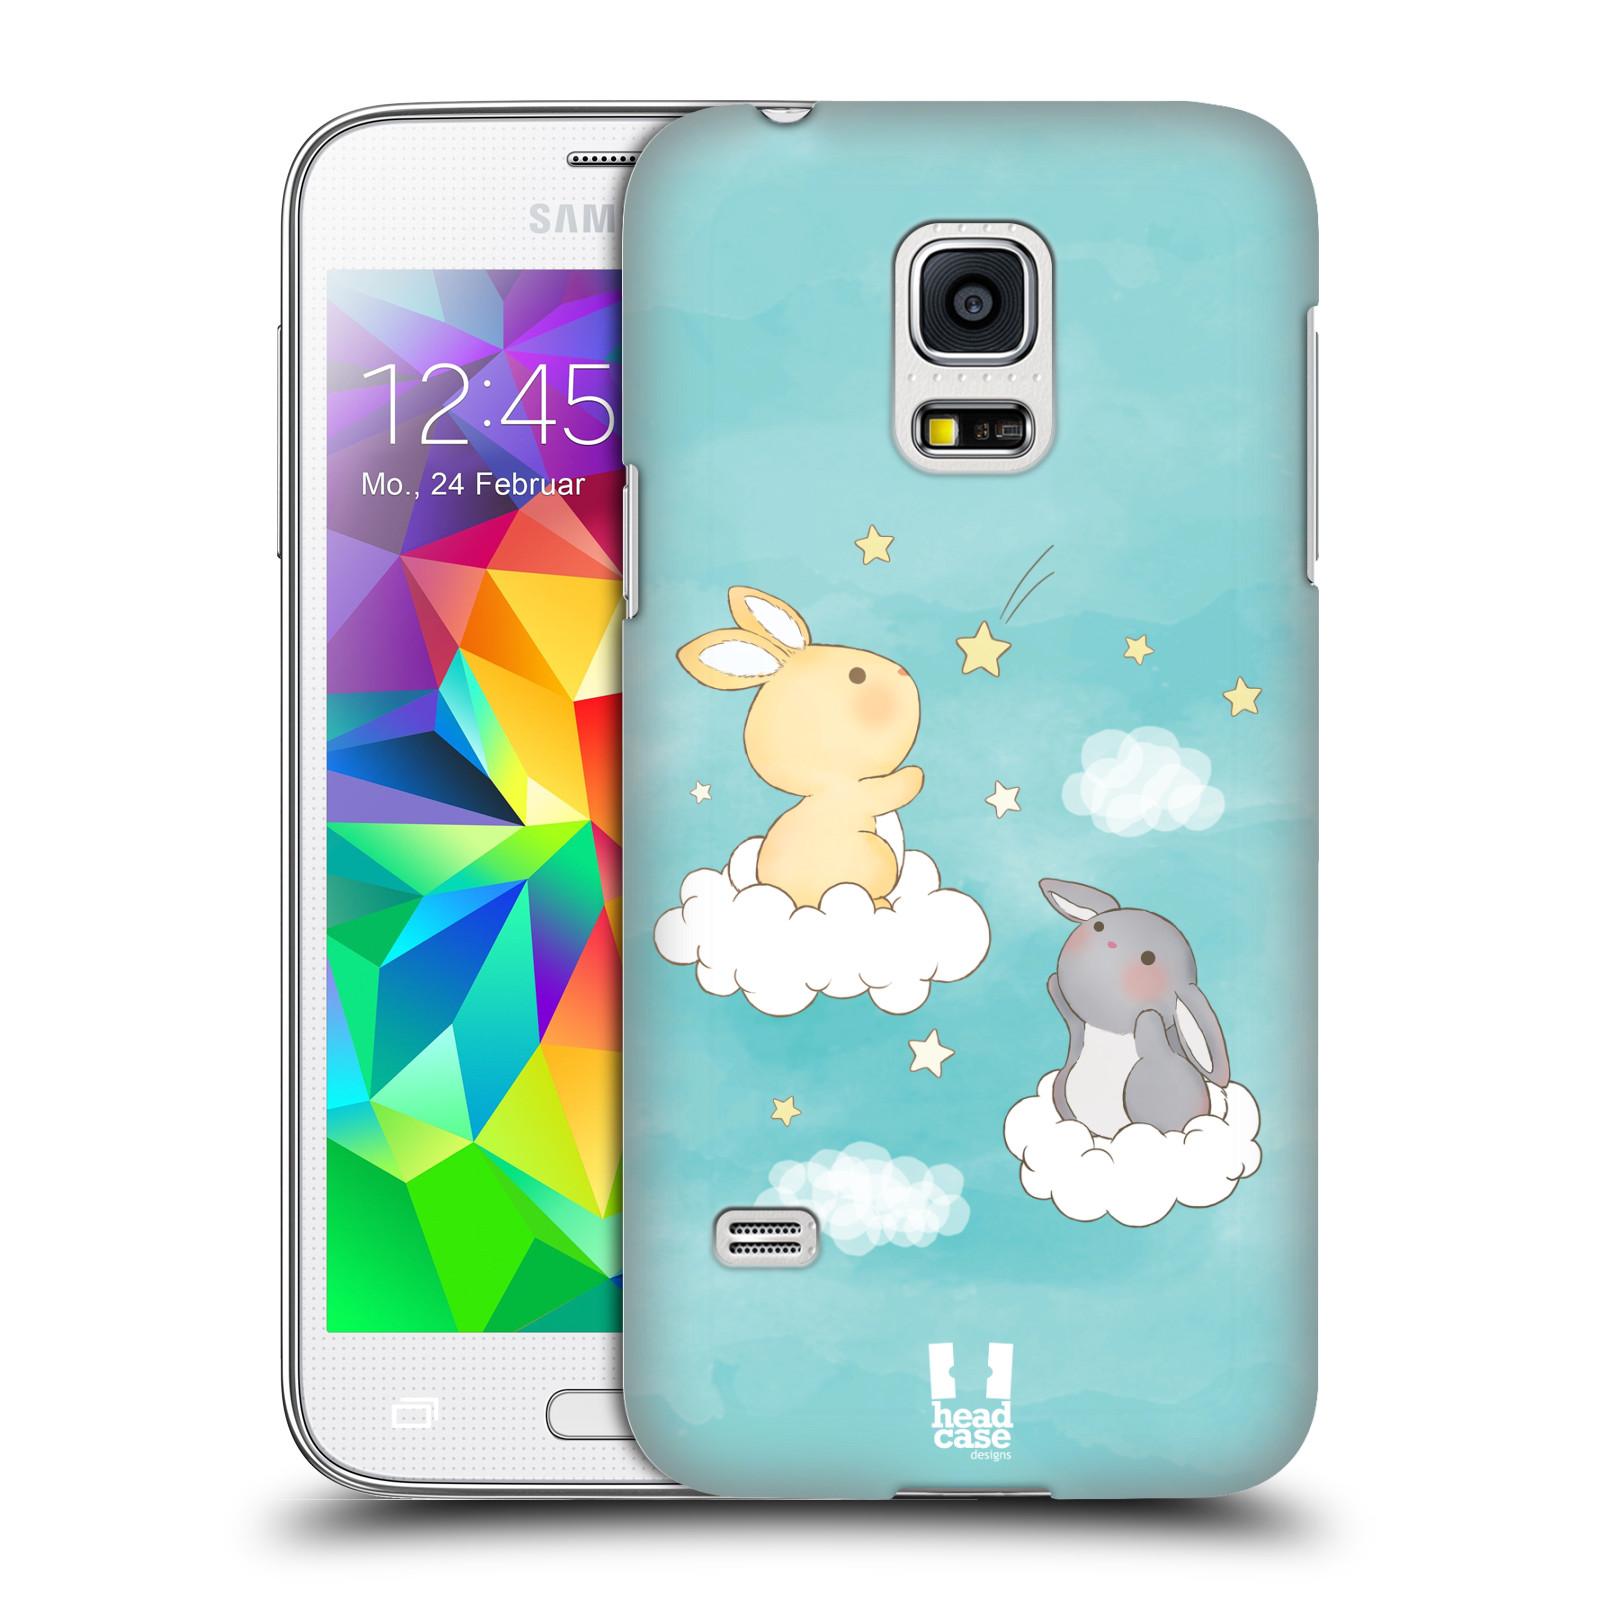 HEAD CASE plastový obal na mobil SAMSUNG Galaxy S5 MINI / S5 MINI DUOS vzor králíček a hvězdy modrá